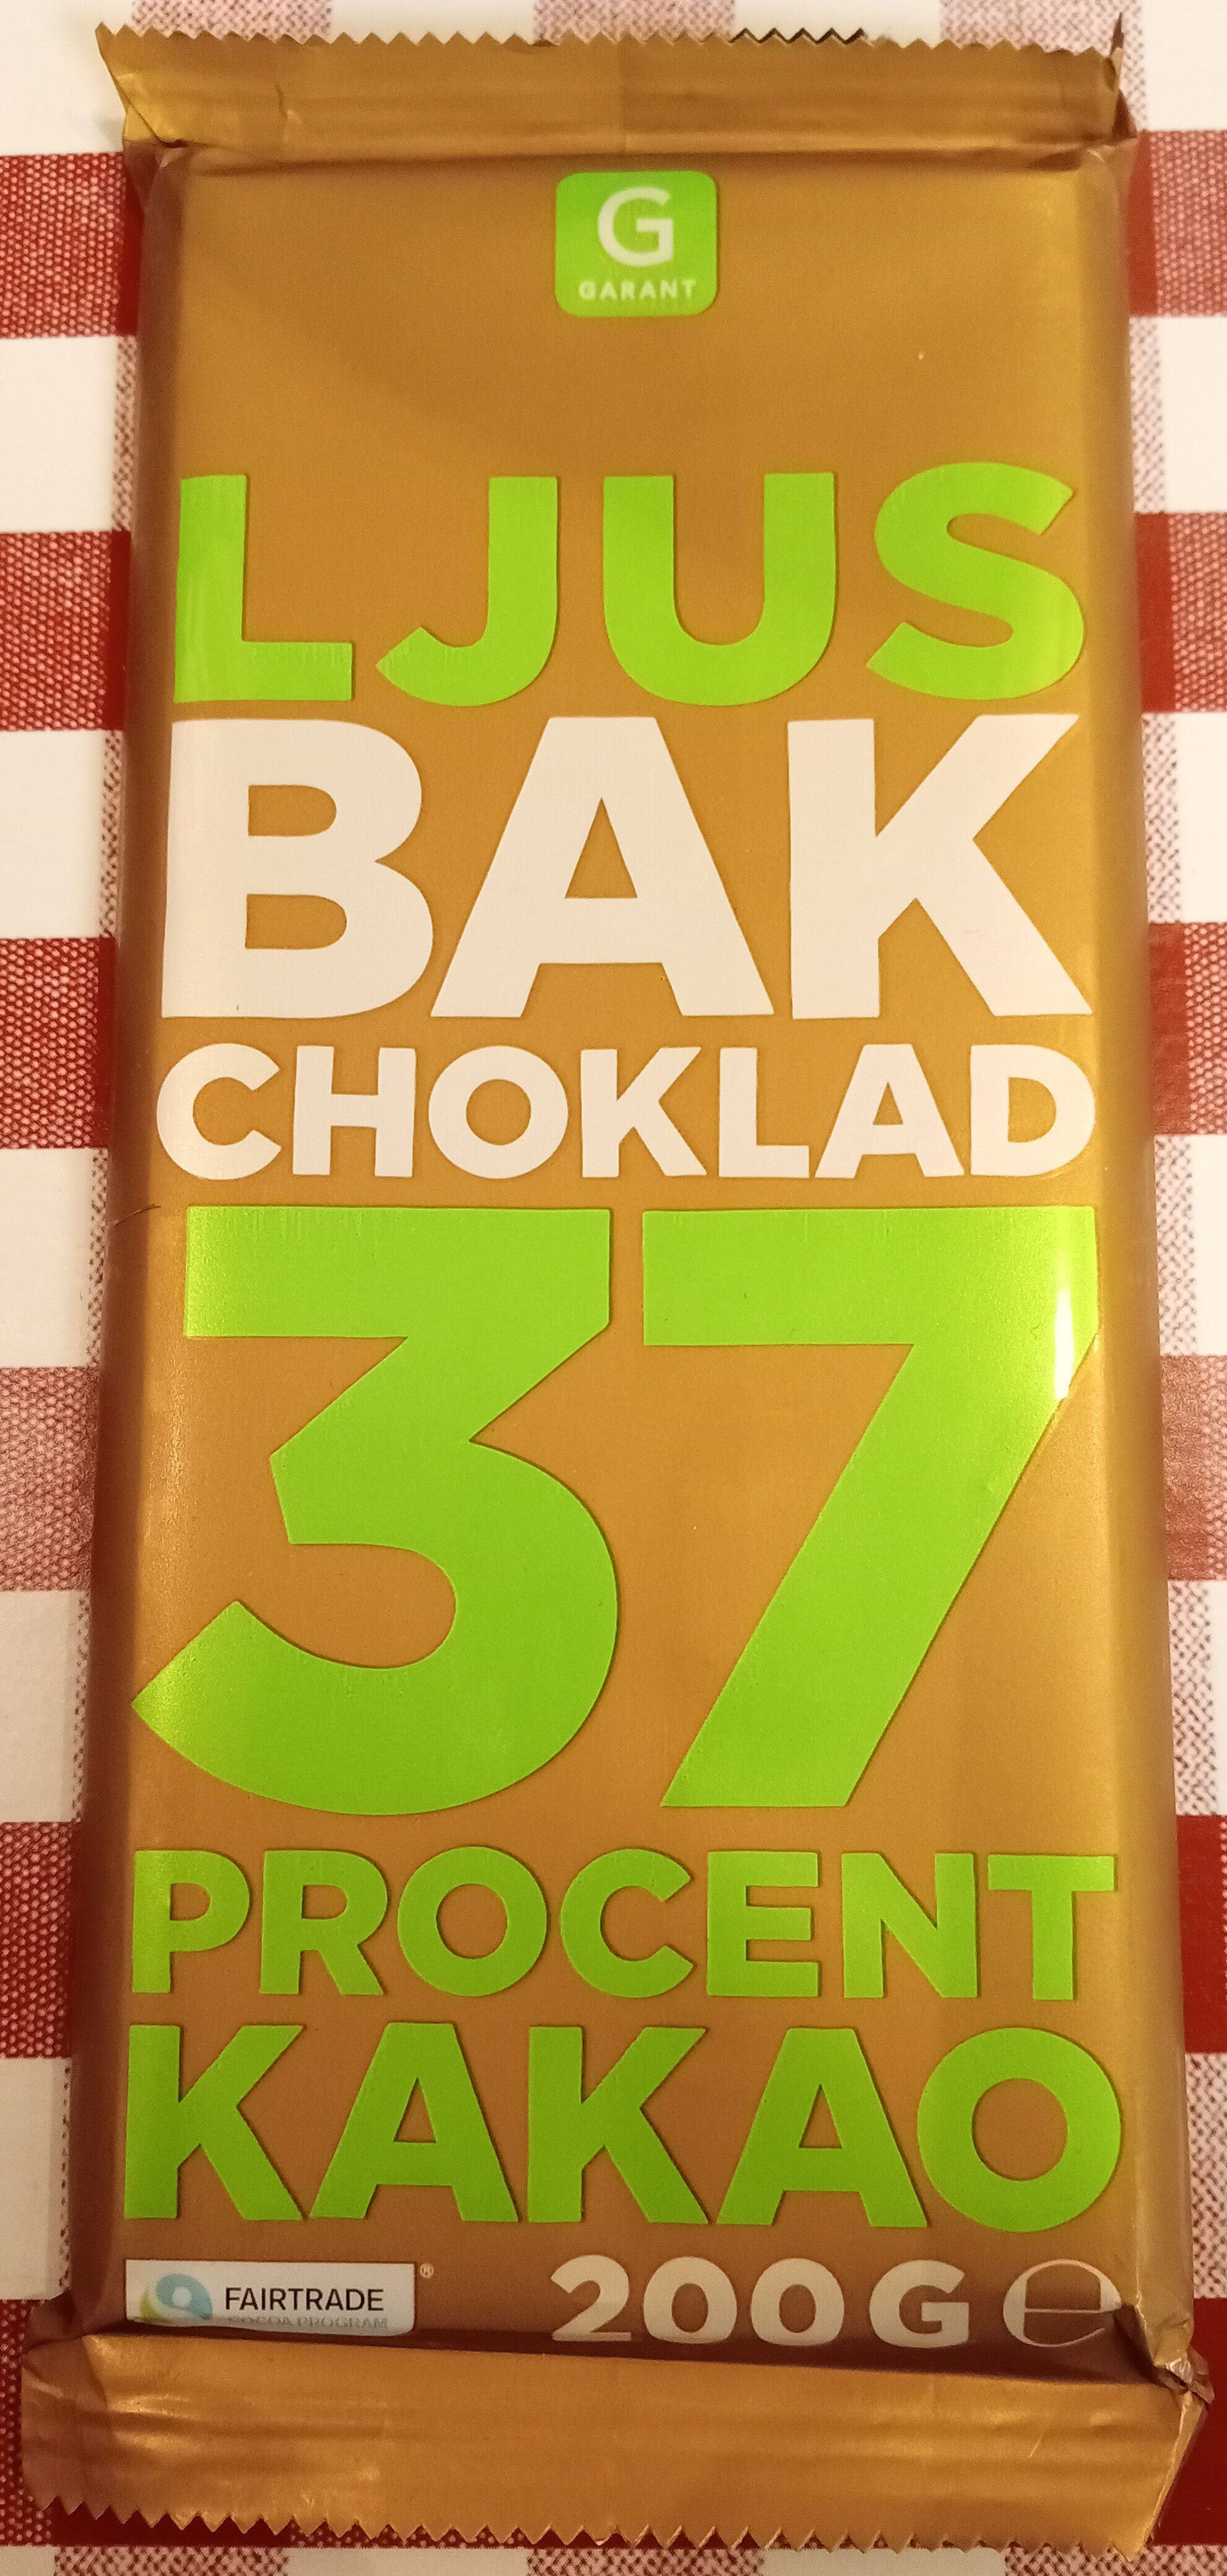 Garant Ljus bakchoklad 37 % kakao - Produit - sv